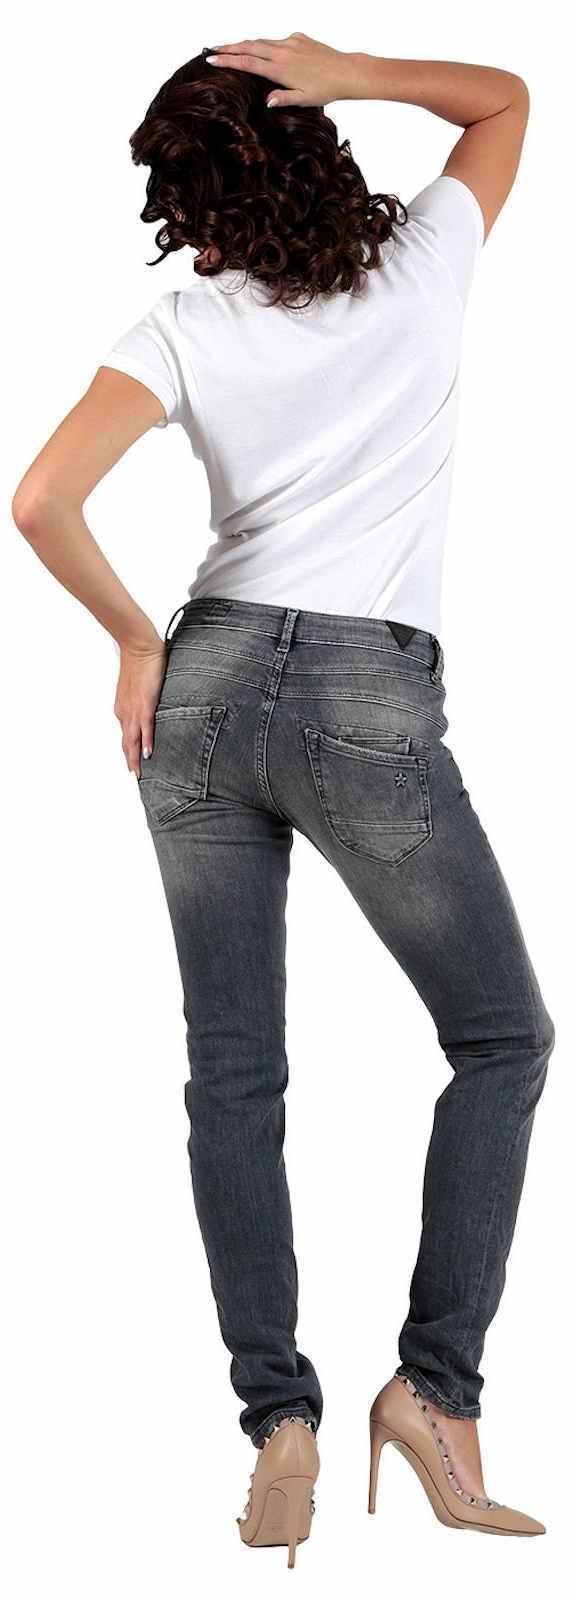 M.O.D Damen Jeans Ulla Slim NOS-2020 Hüft Hose Low Waist Slim Leg MOD Grau